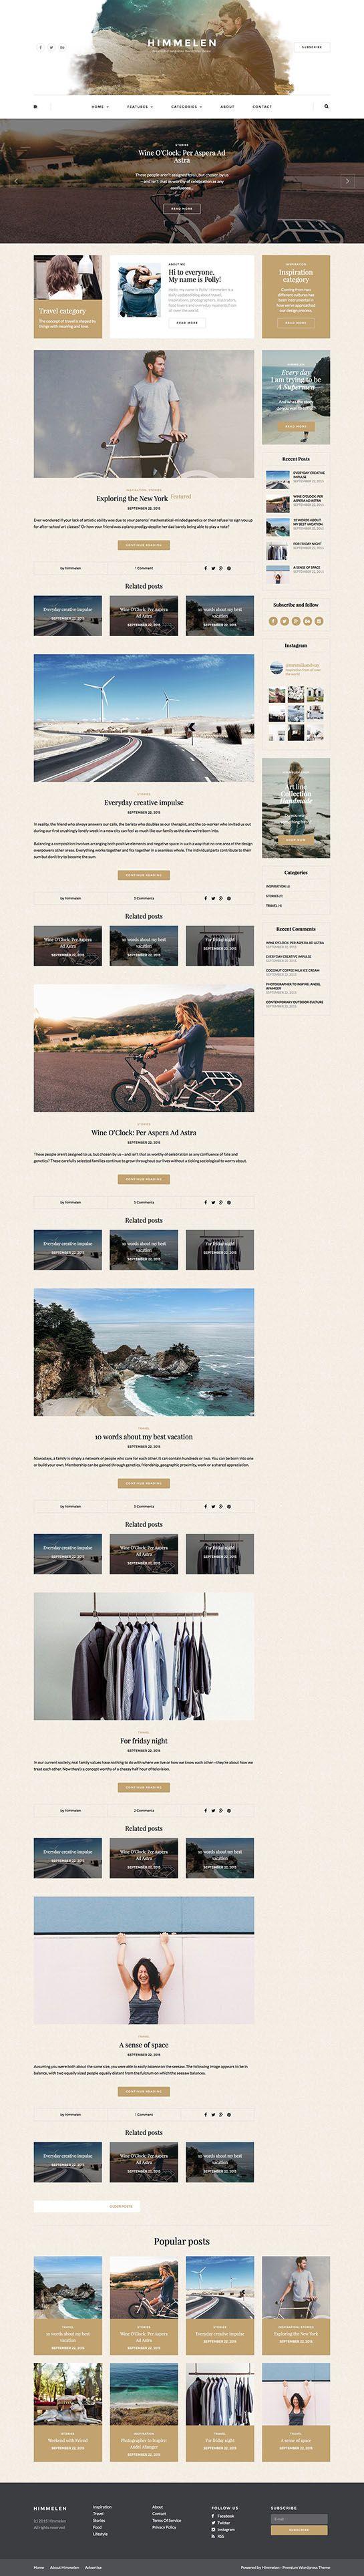 Himmelen Demo 2   Templates   Pinterest   Wordpress blog themes ...